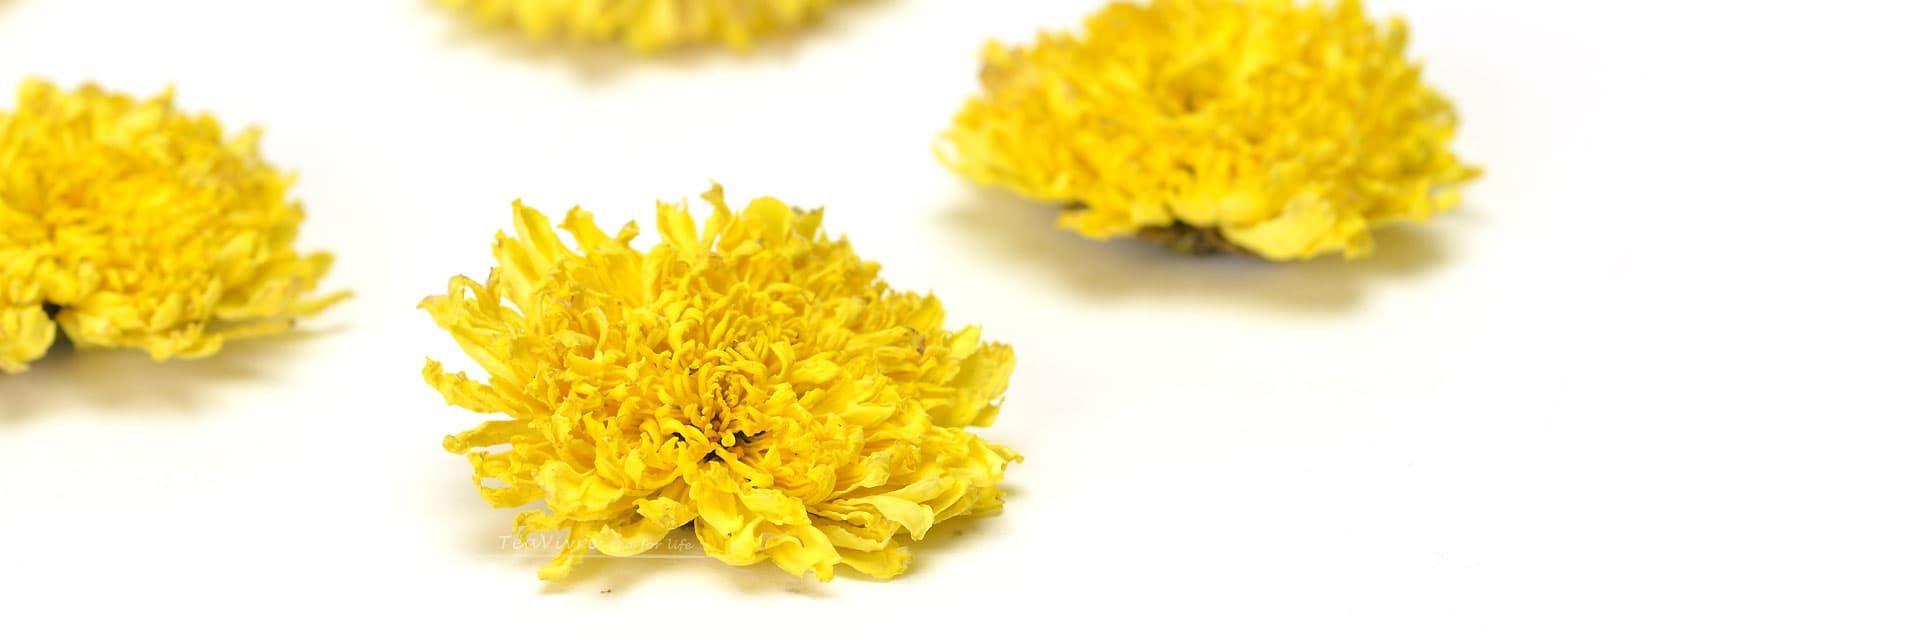 Huizhou emperor chrysanthemum tea teavivre huizhou emperor chrysanthemum tea 1 mightylinksfo